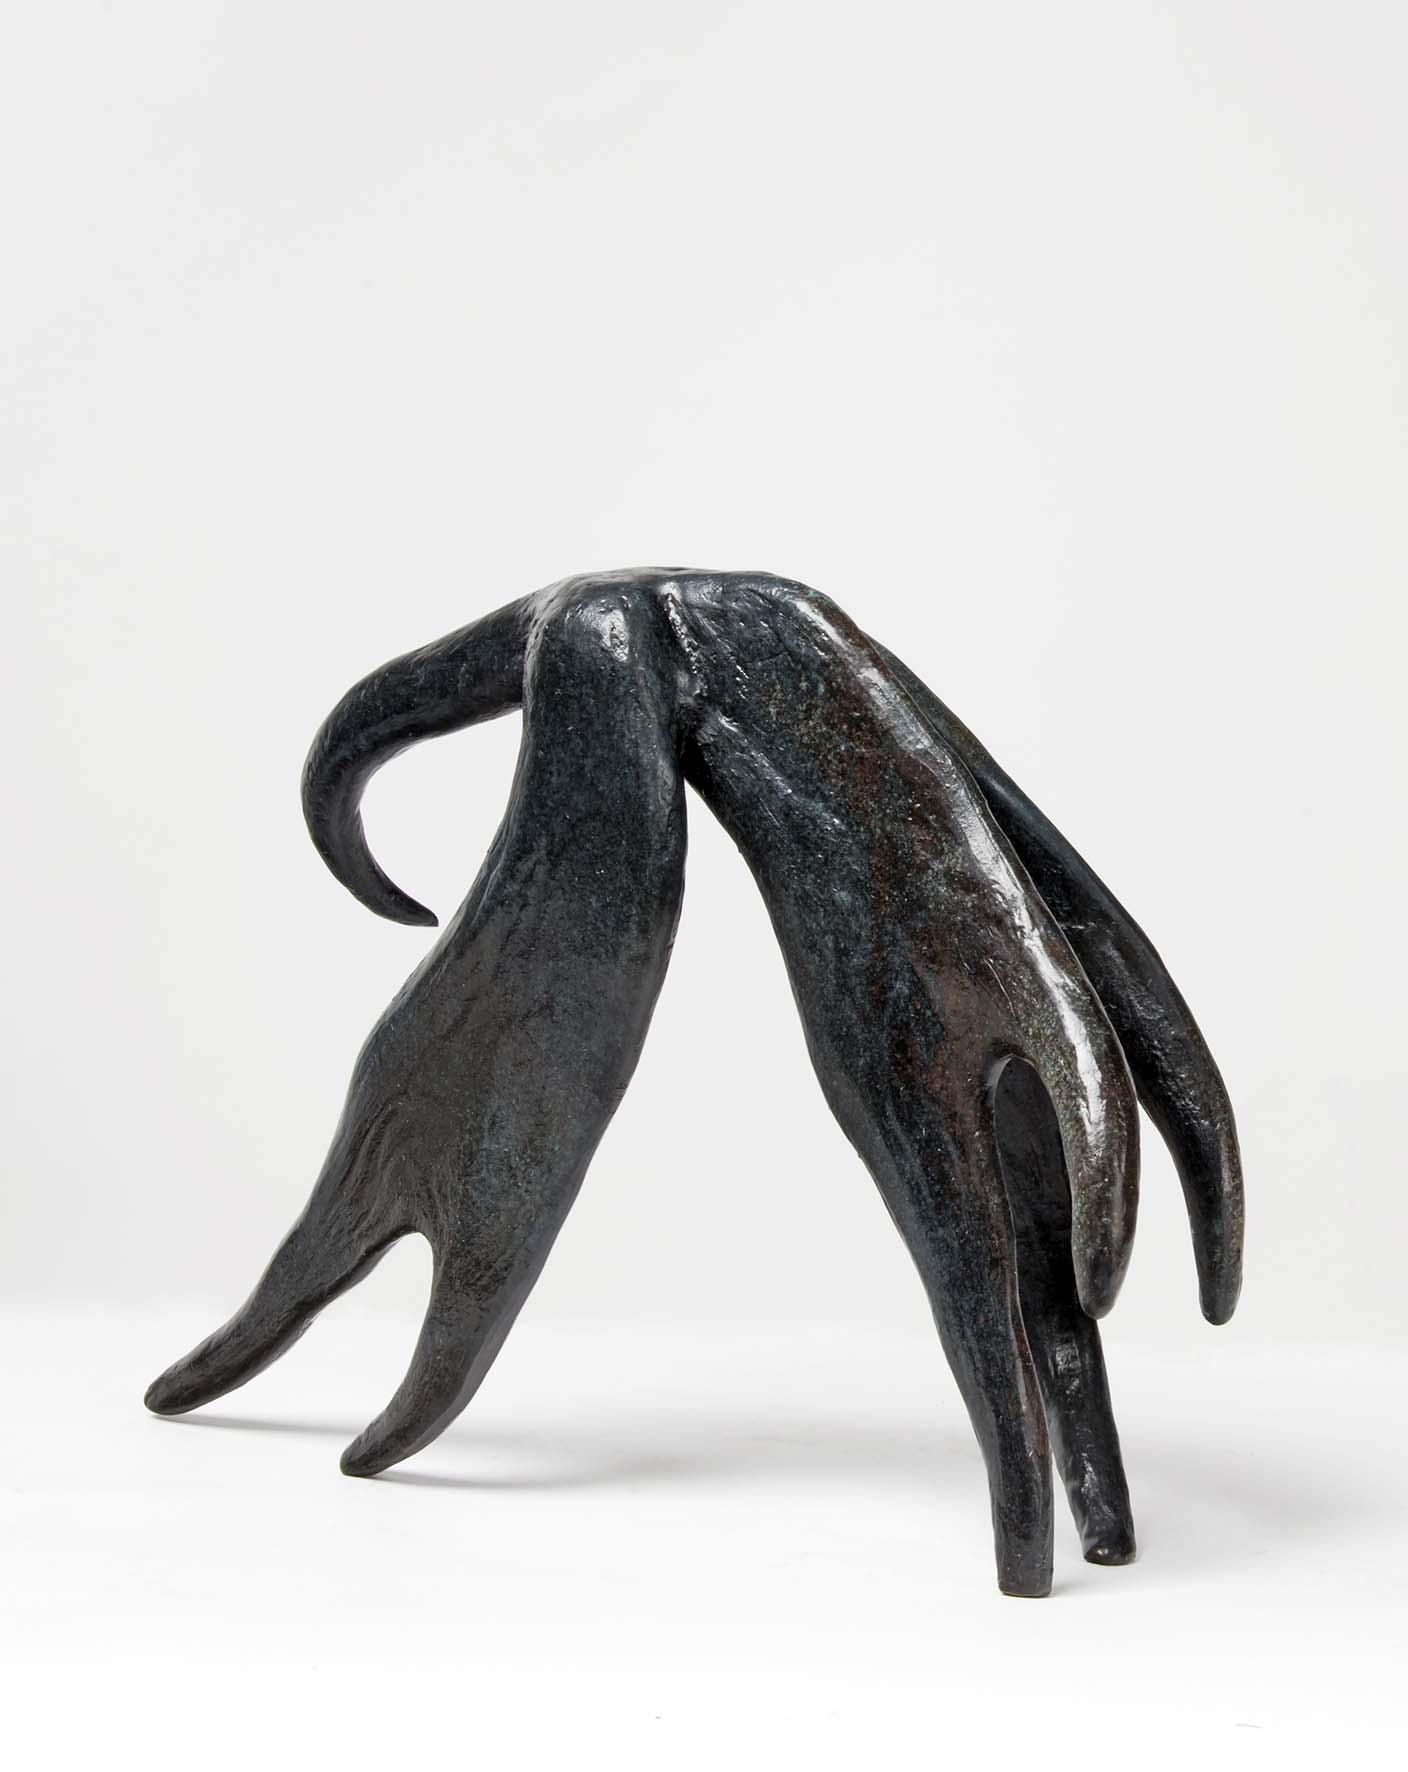 Beatrice Magalotti_Valkyrie_21 x 25 x7 cm_Bronze